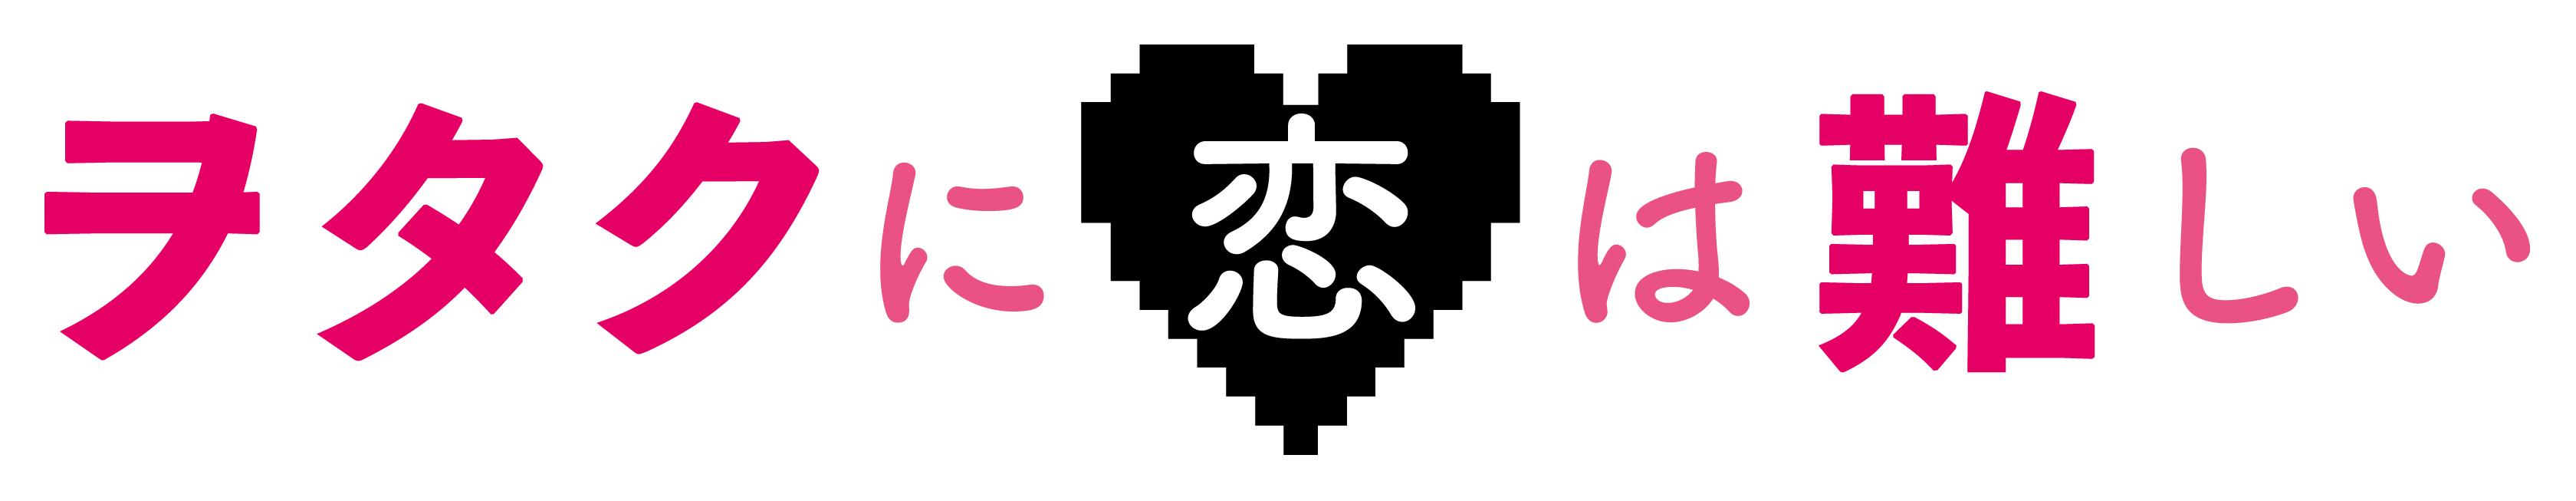 wotakoi_title_yoko